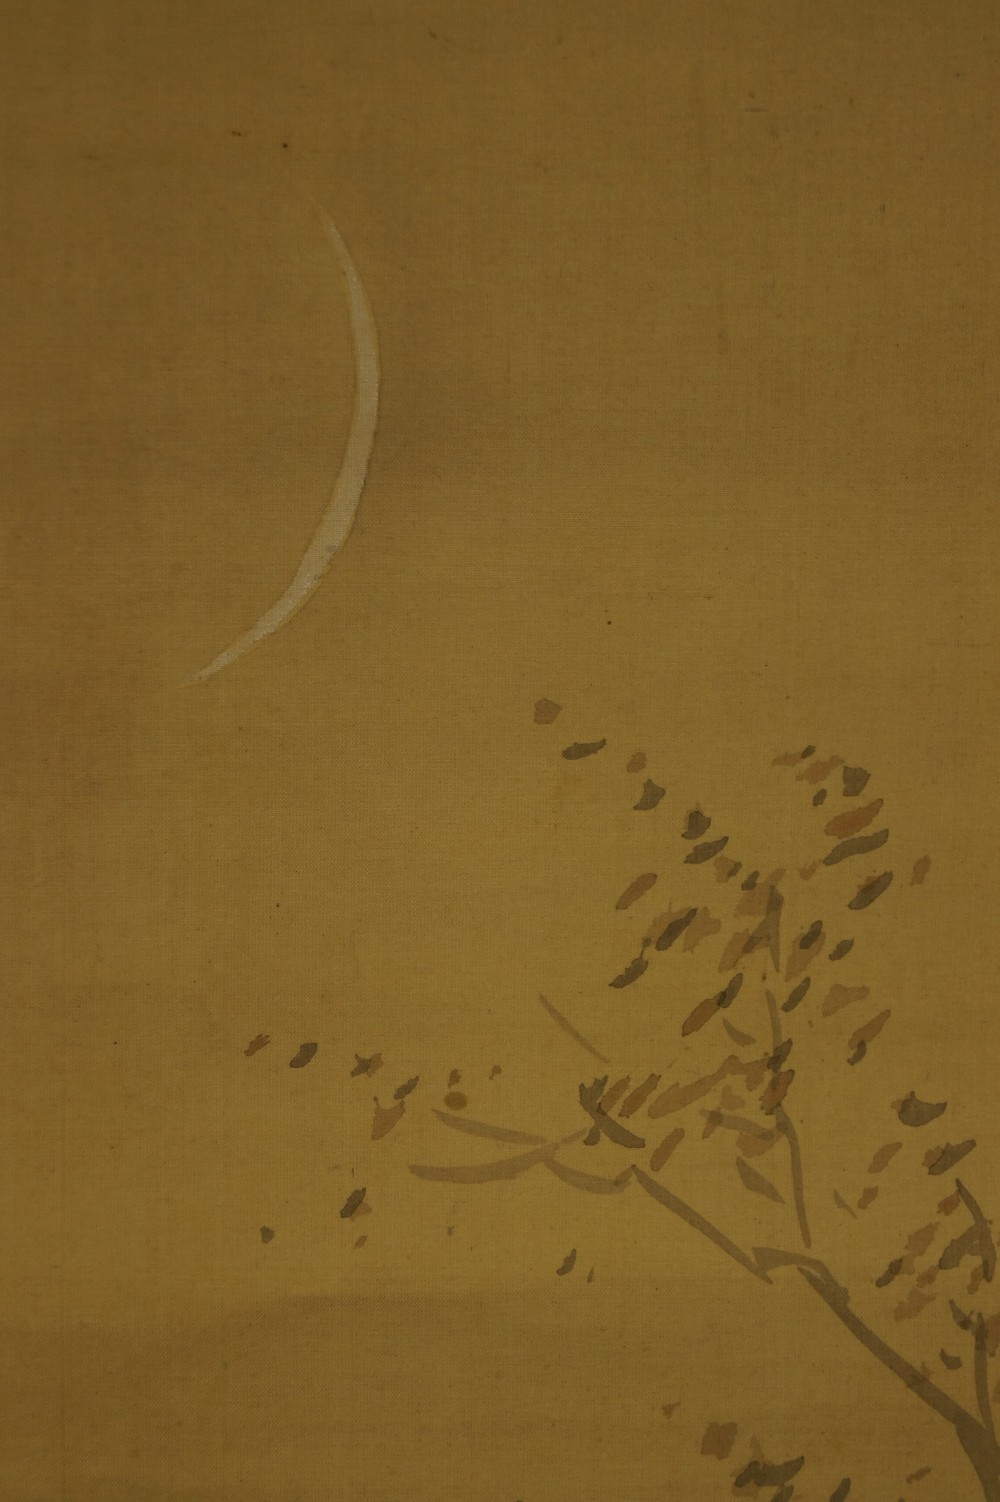 Herbstnacht im Wald - Japanisches Rollbild (Kakejiku, Kakemono)